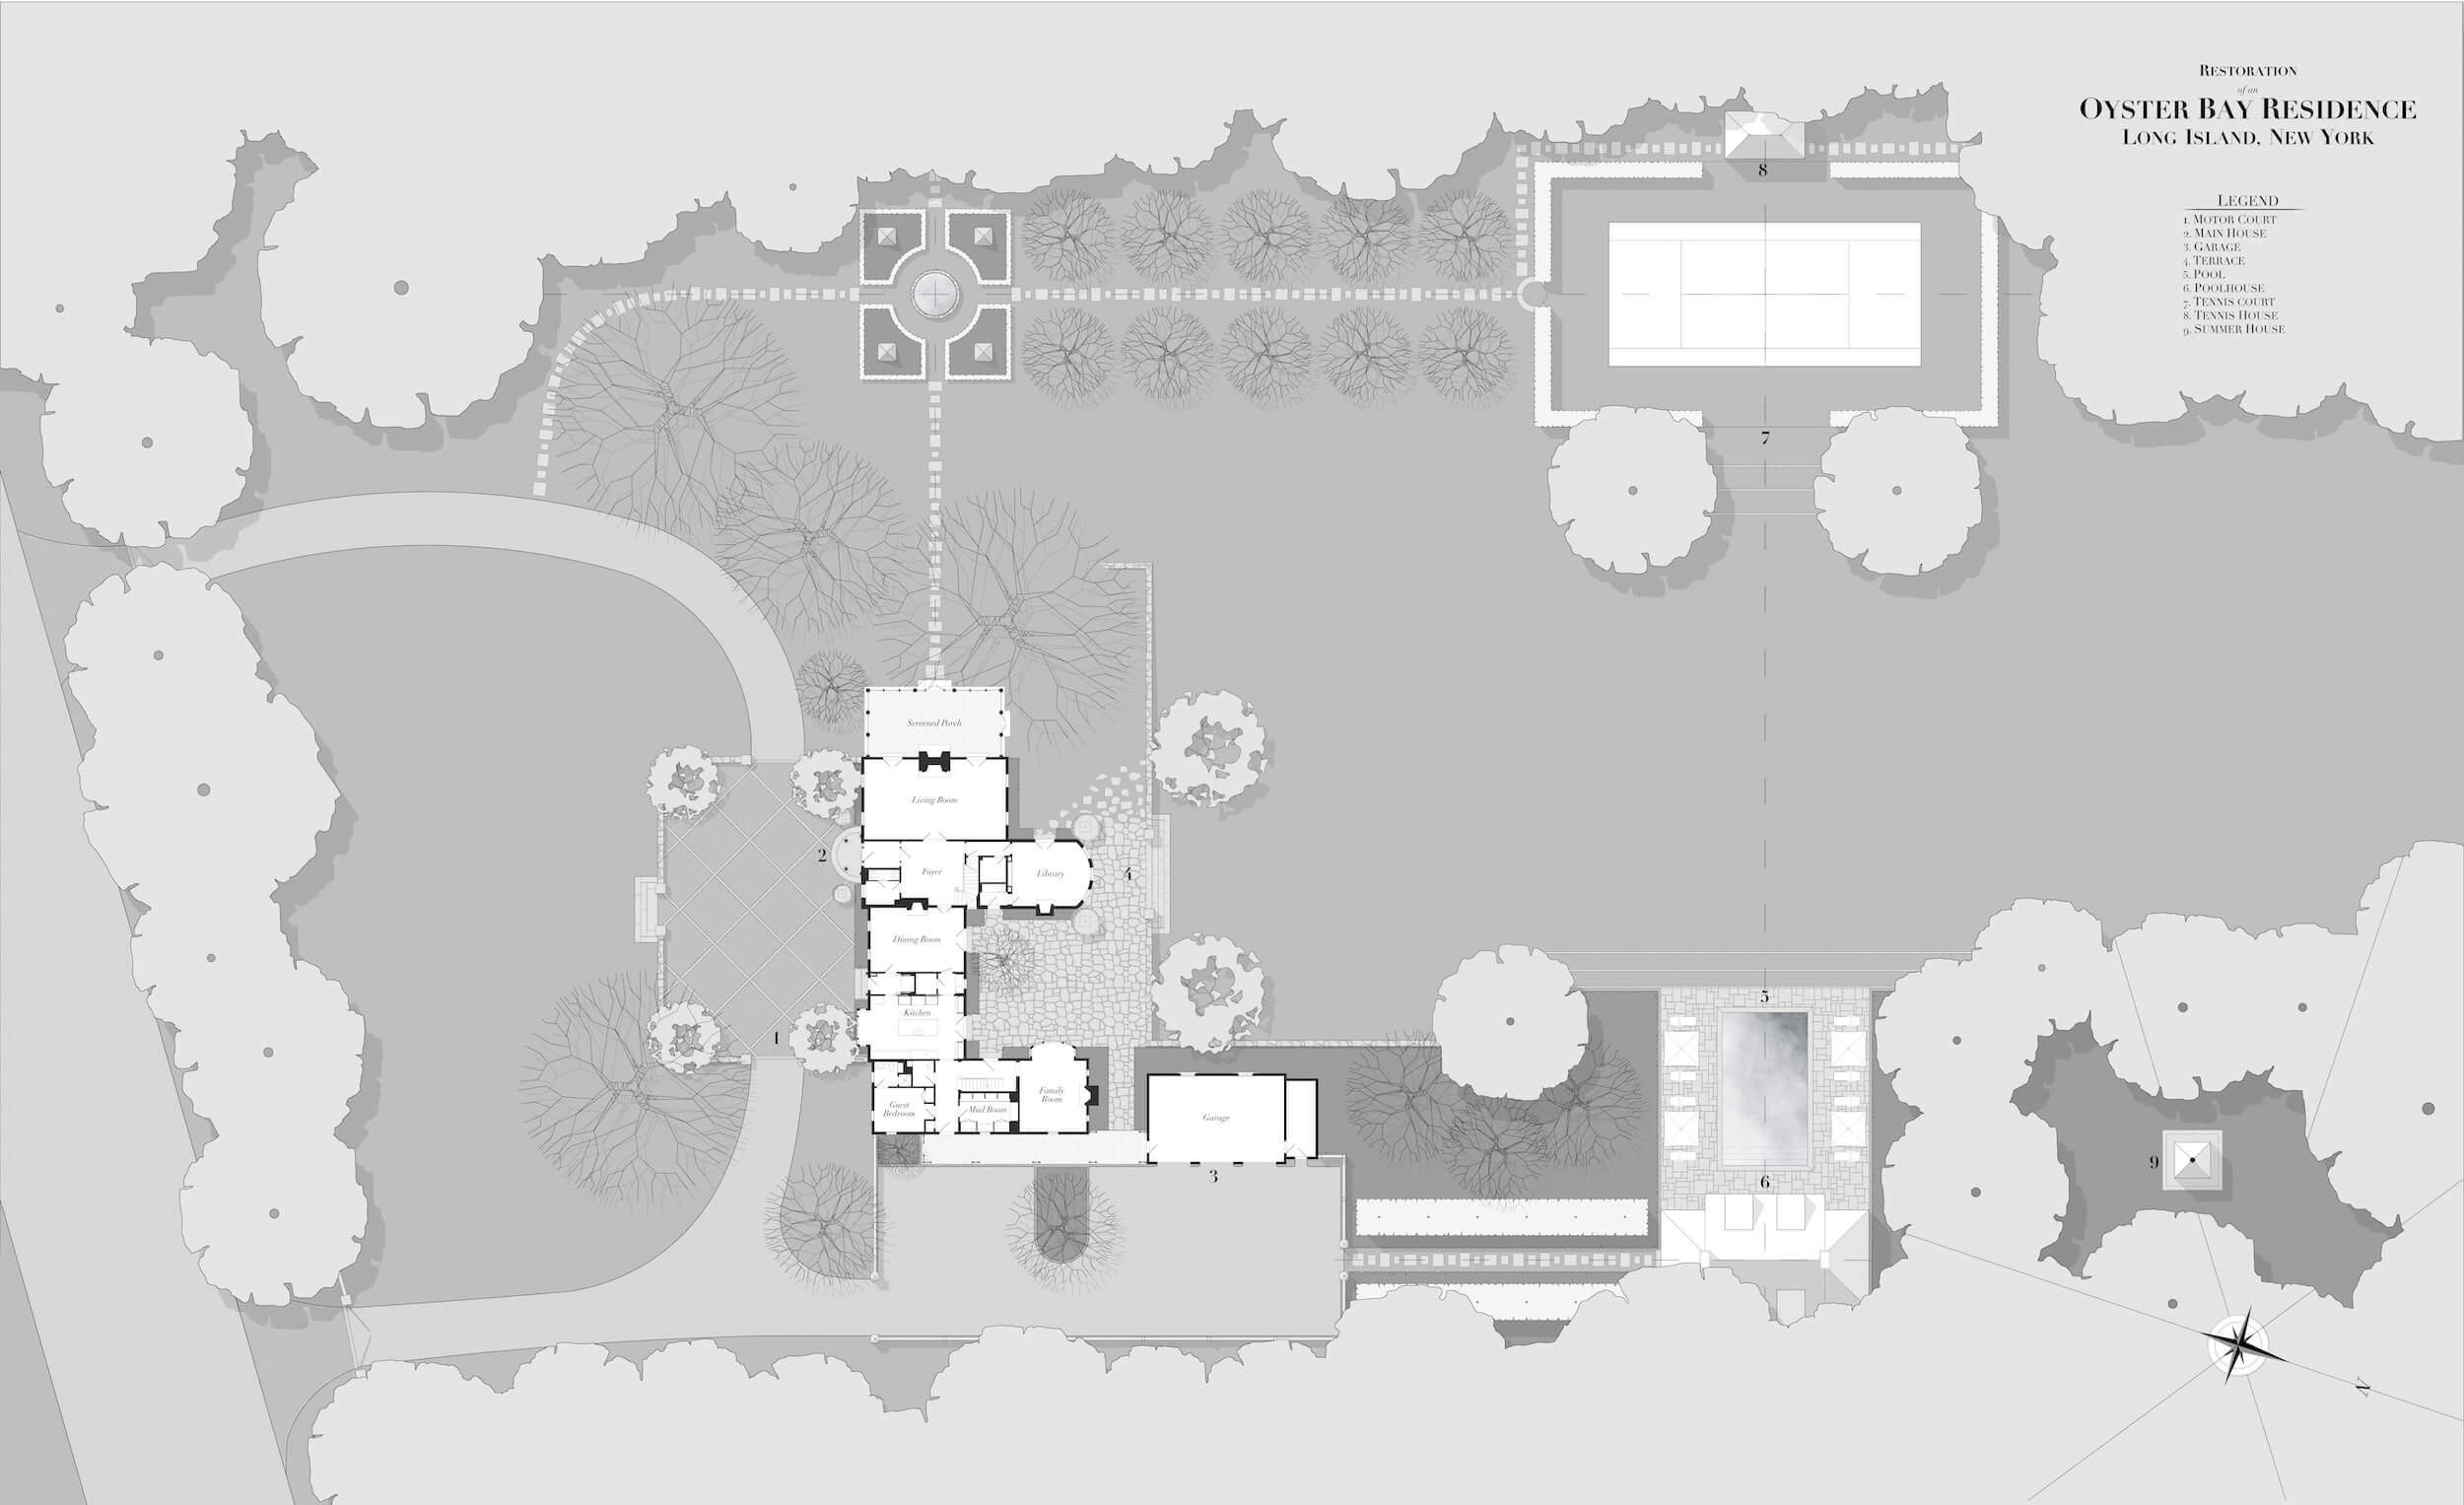 Busconi+Site+Plan.jpg